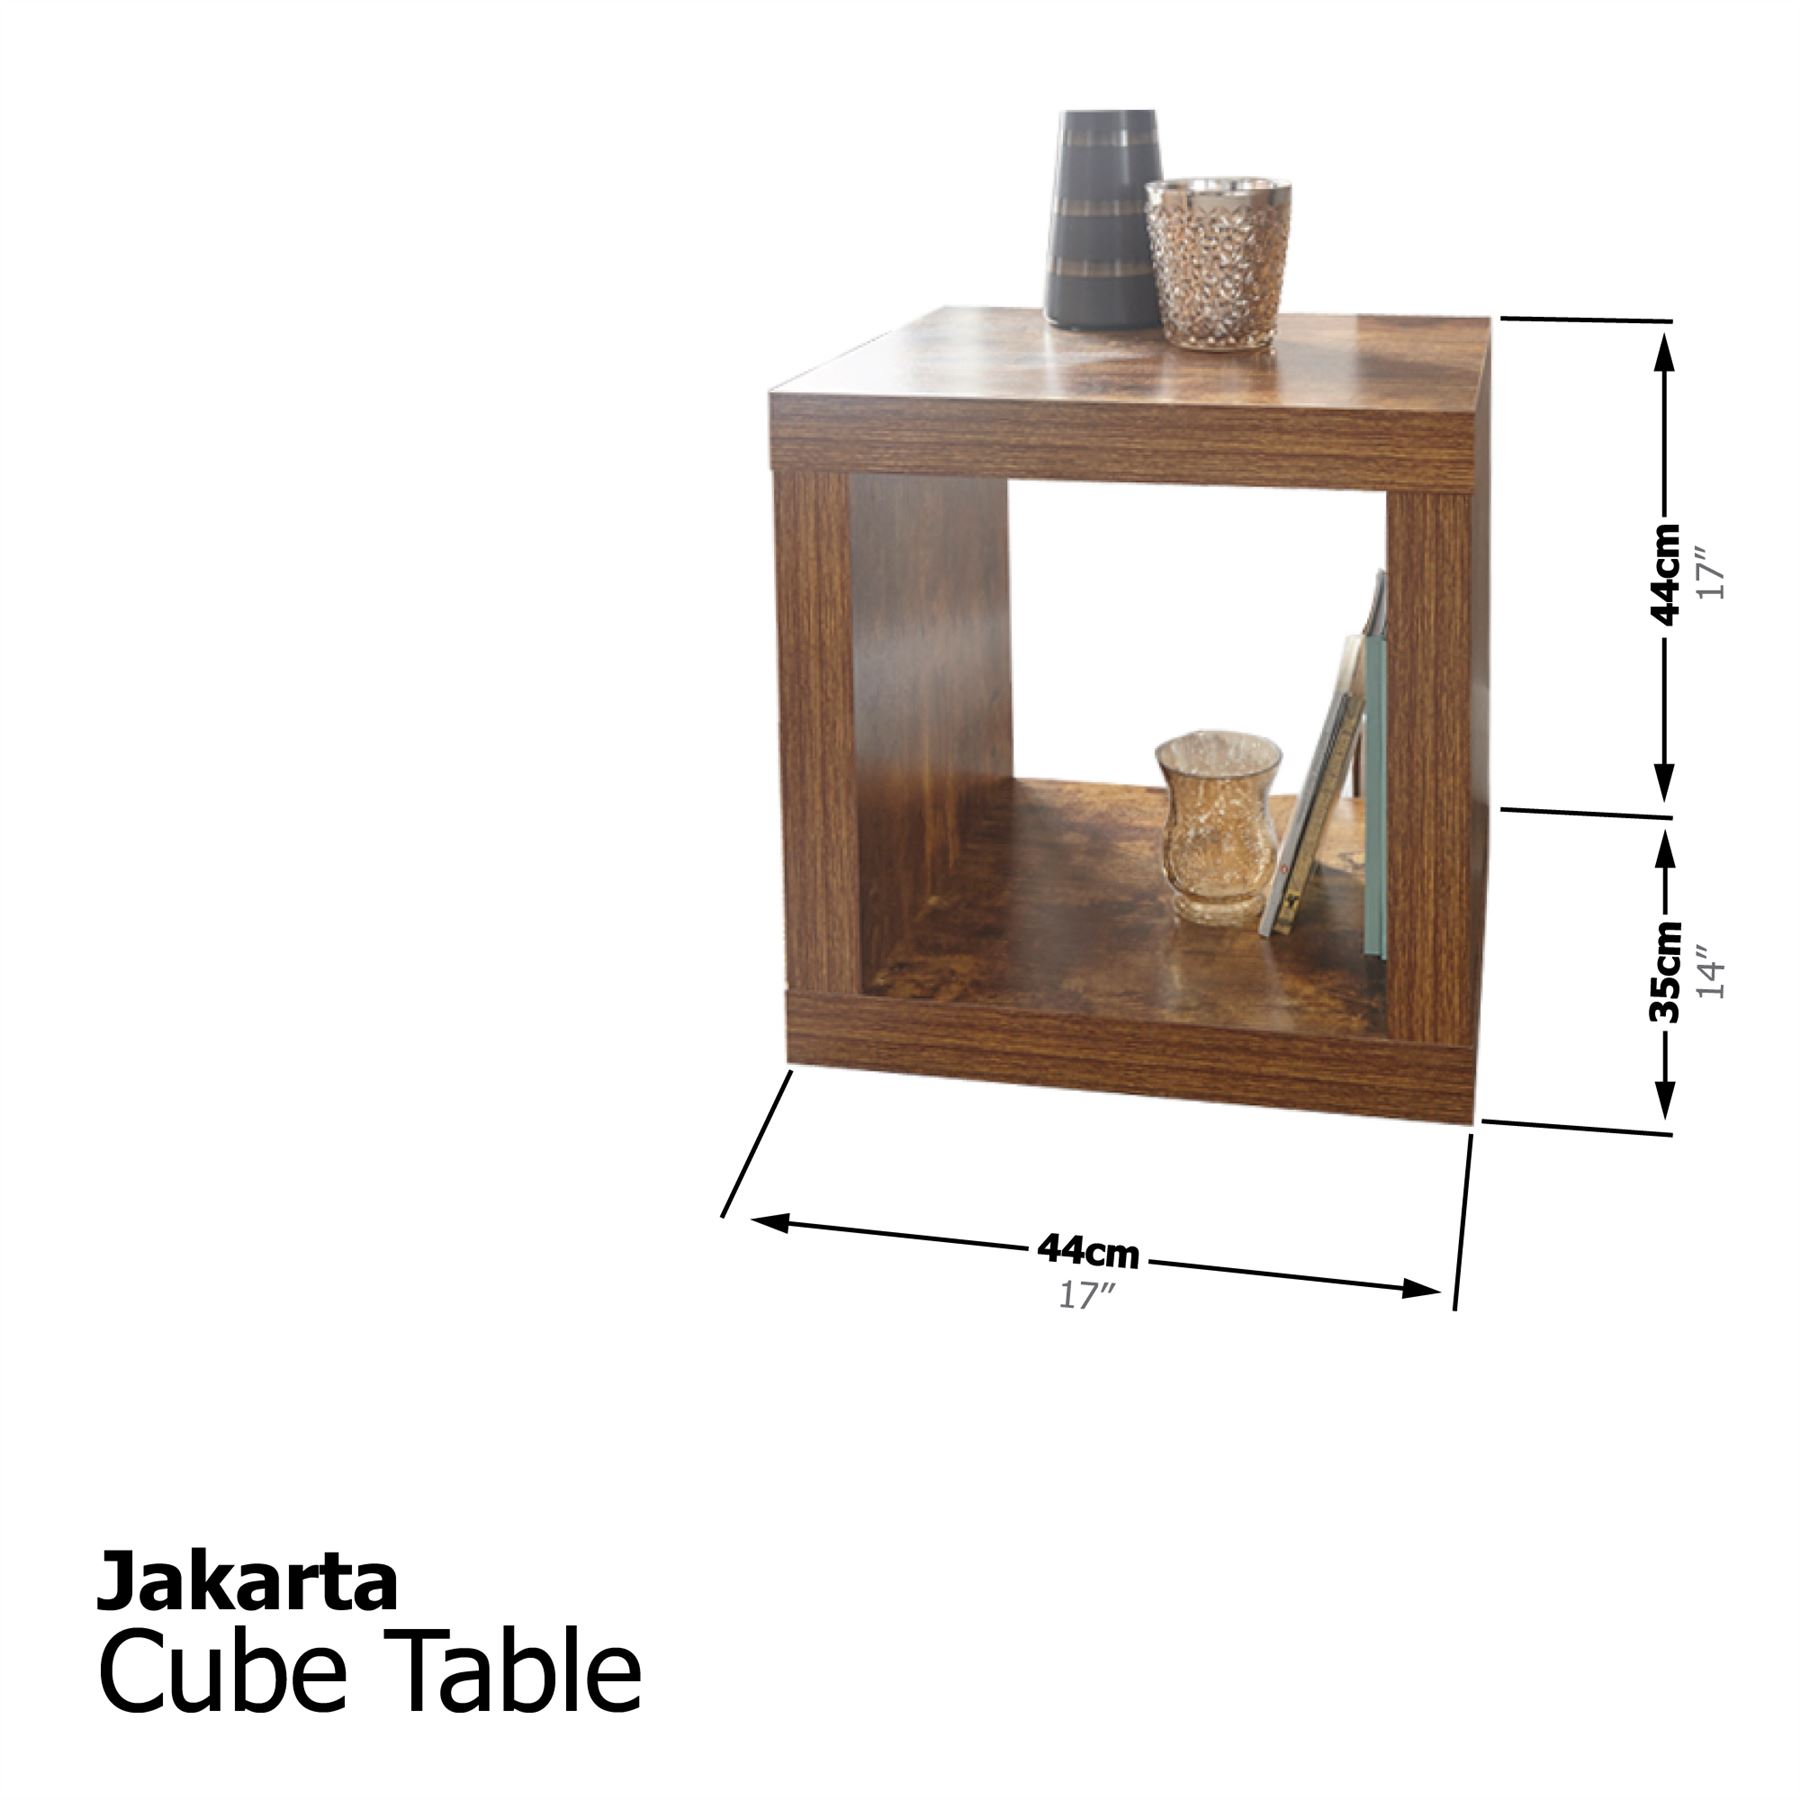 JAKARTA MANGO LIVING ROOM NEST TABLE SLIM DRAWERS TV UNIT CUBE